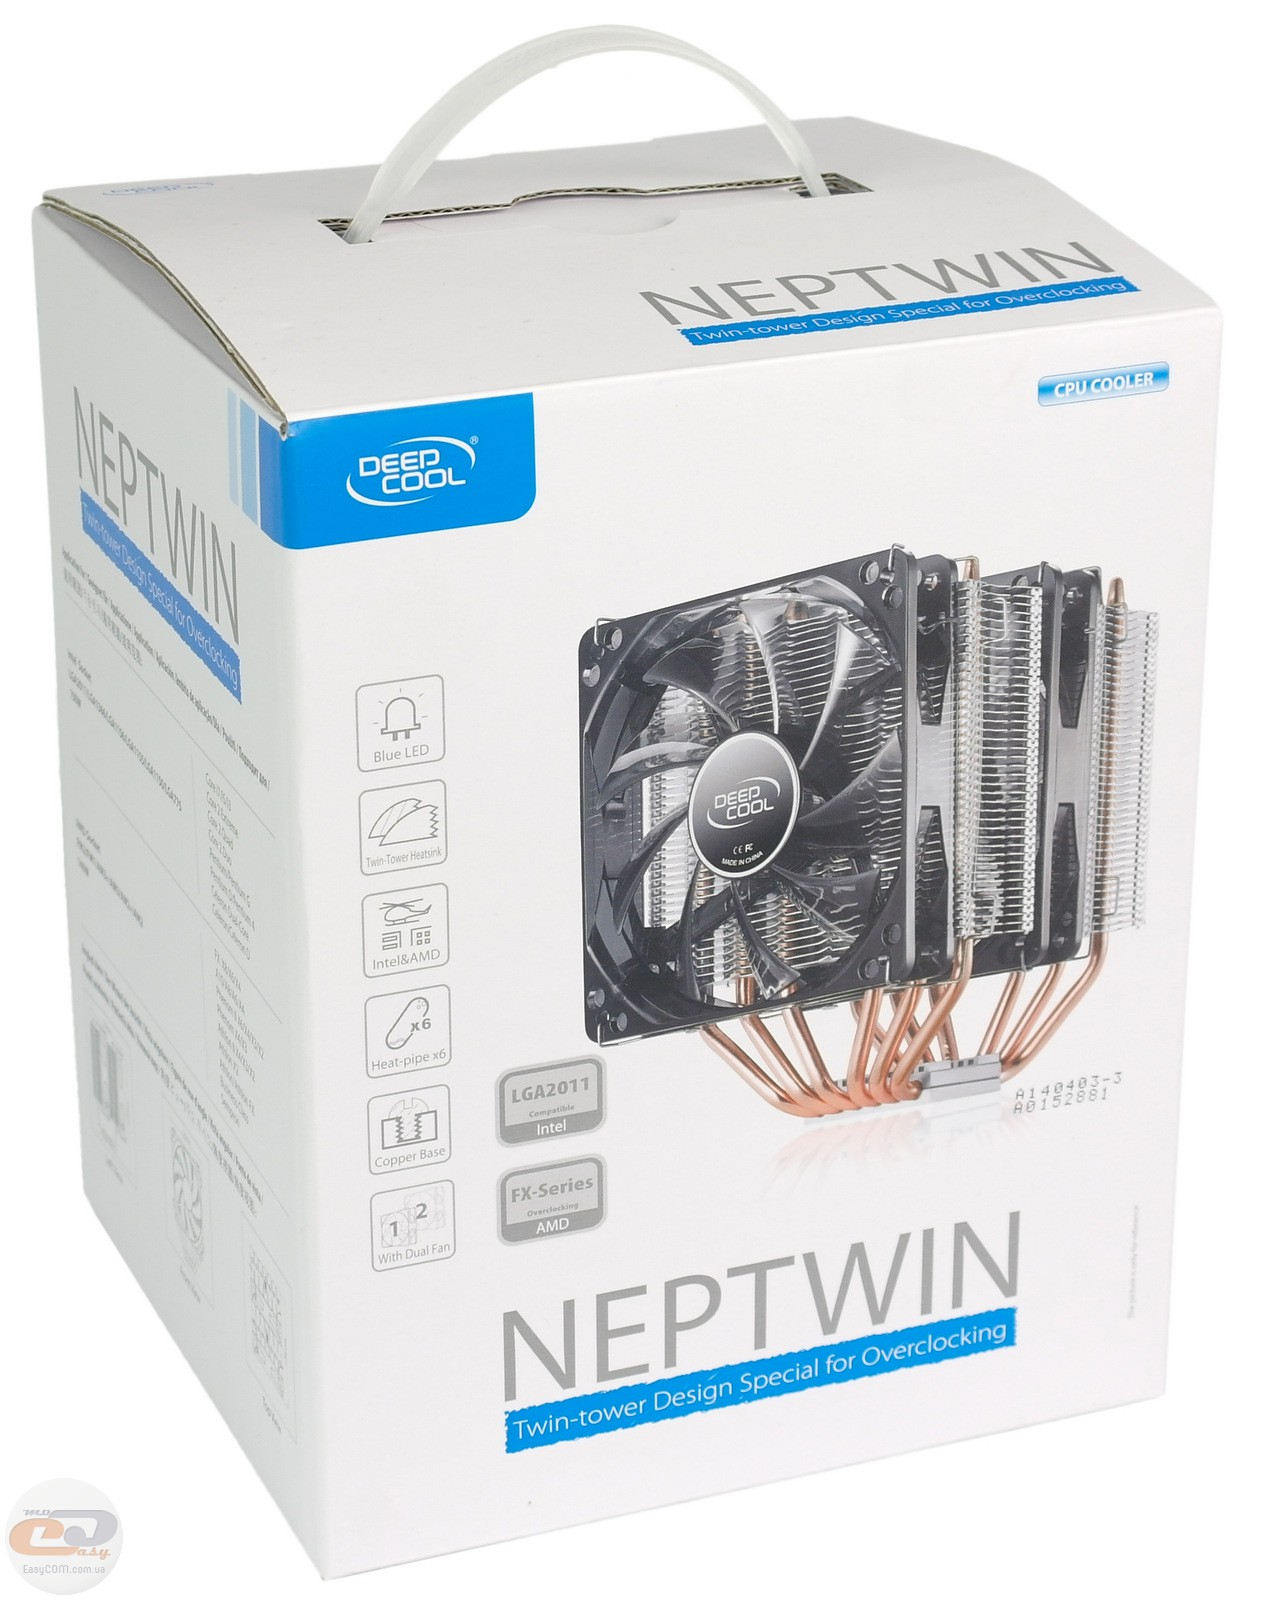 Кулер Deepcool Neptwin V2 Black DP-MCH6-NT (Intel 2011/1366/1156/1155/1151/1150/775/AMD FM2/FM1/AM3+/AM3/AM2+/AM2)